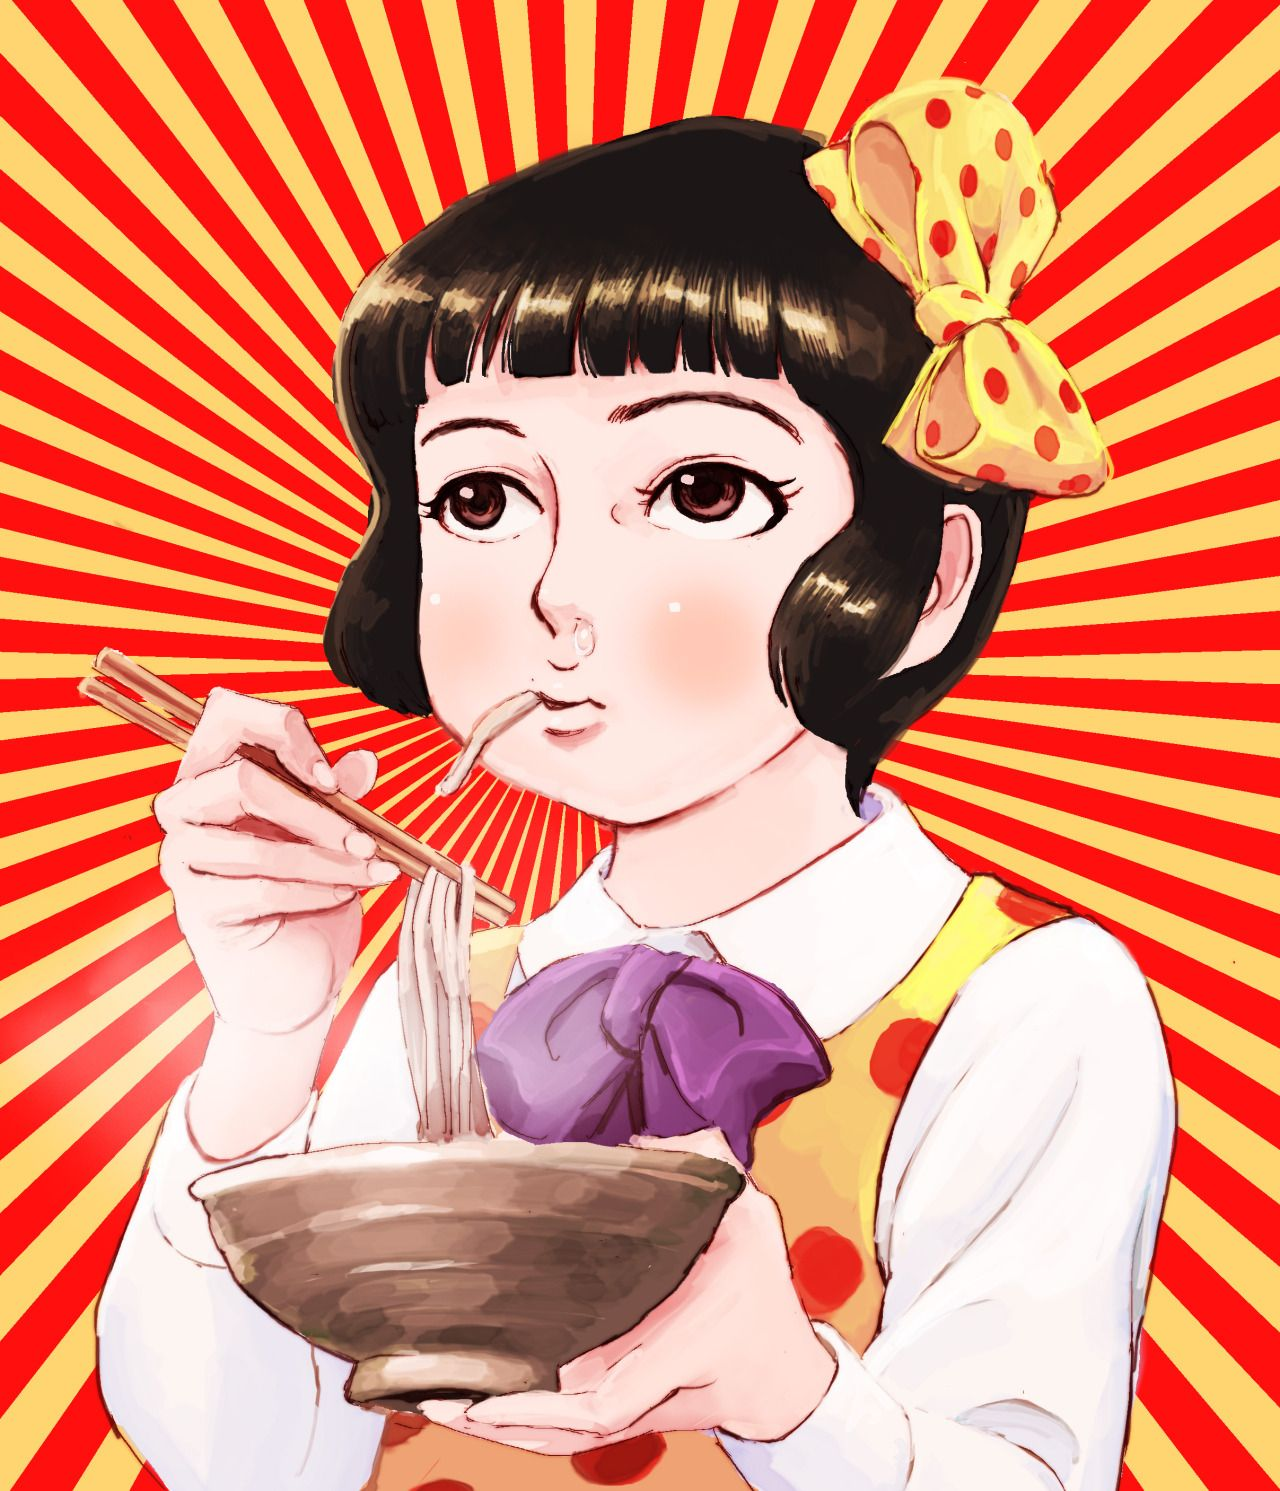 otenbabekki — Midori Shōjo Tsubaki Manga artist